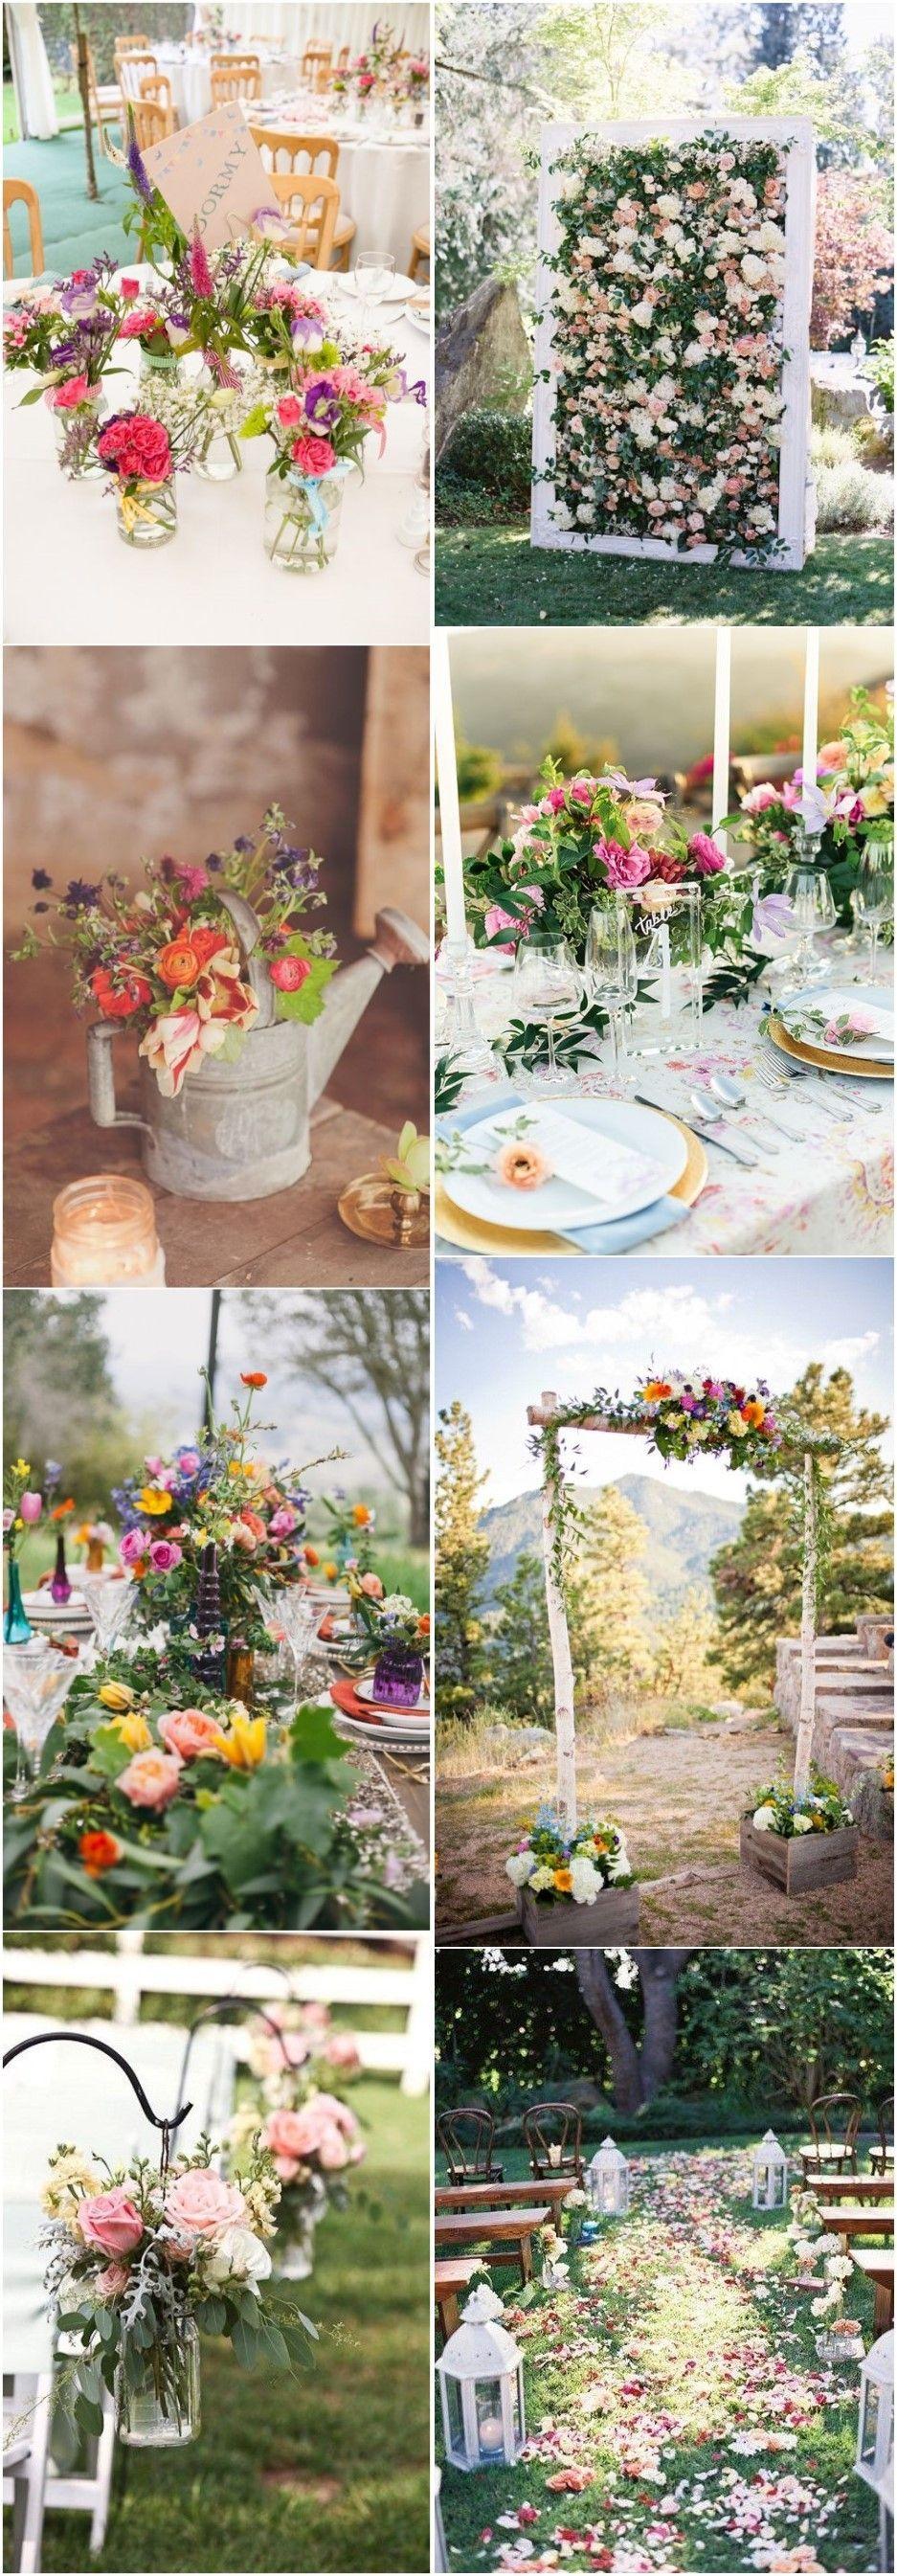 18 Summer Garden Wedding Ideas To Shine